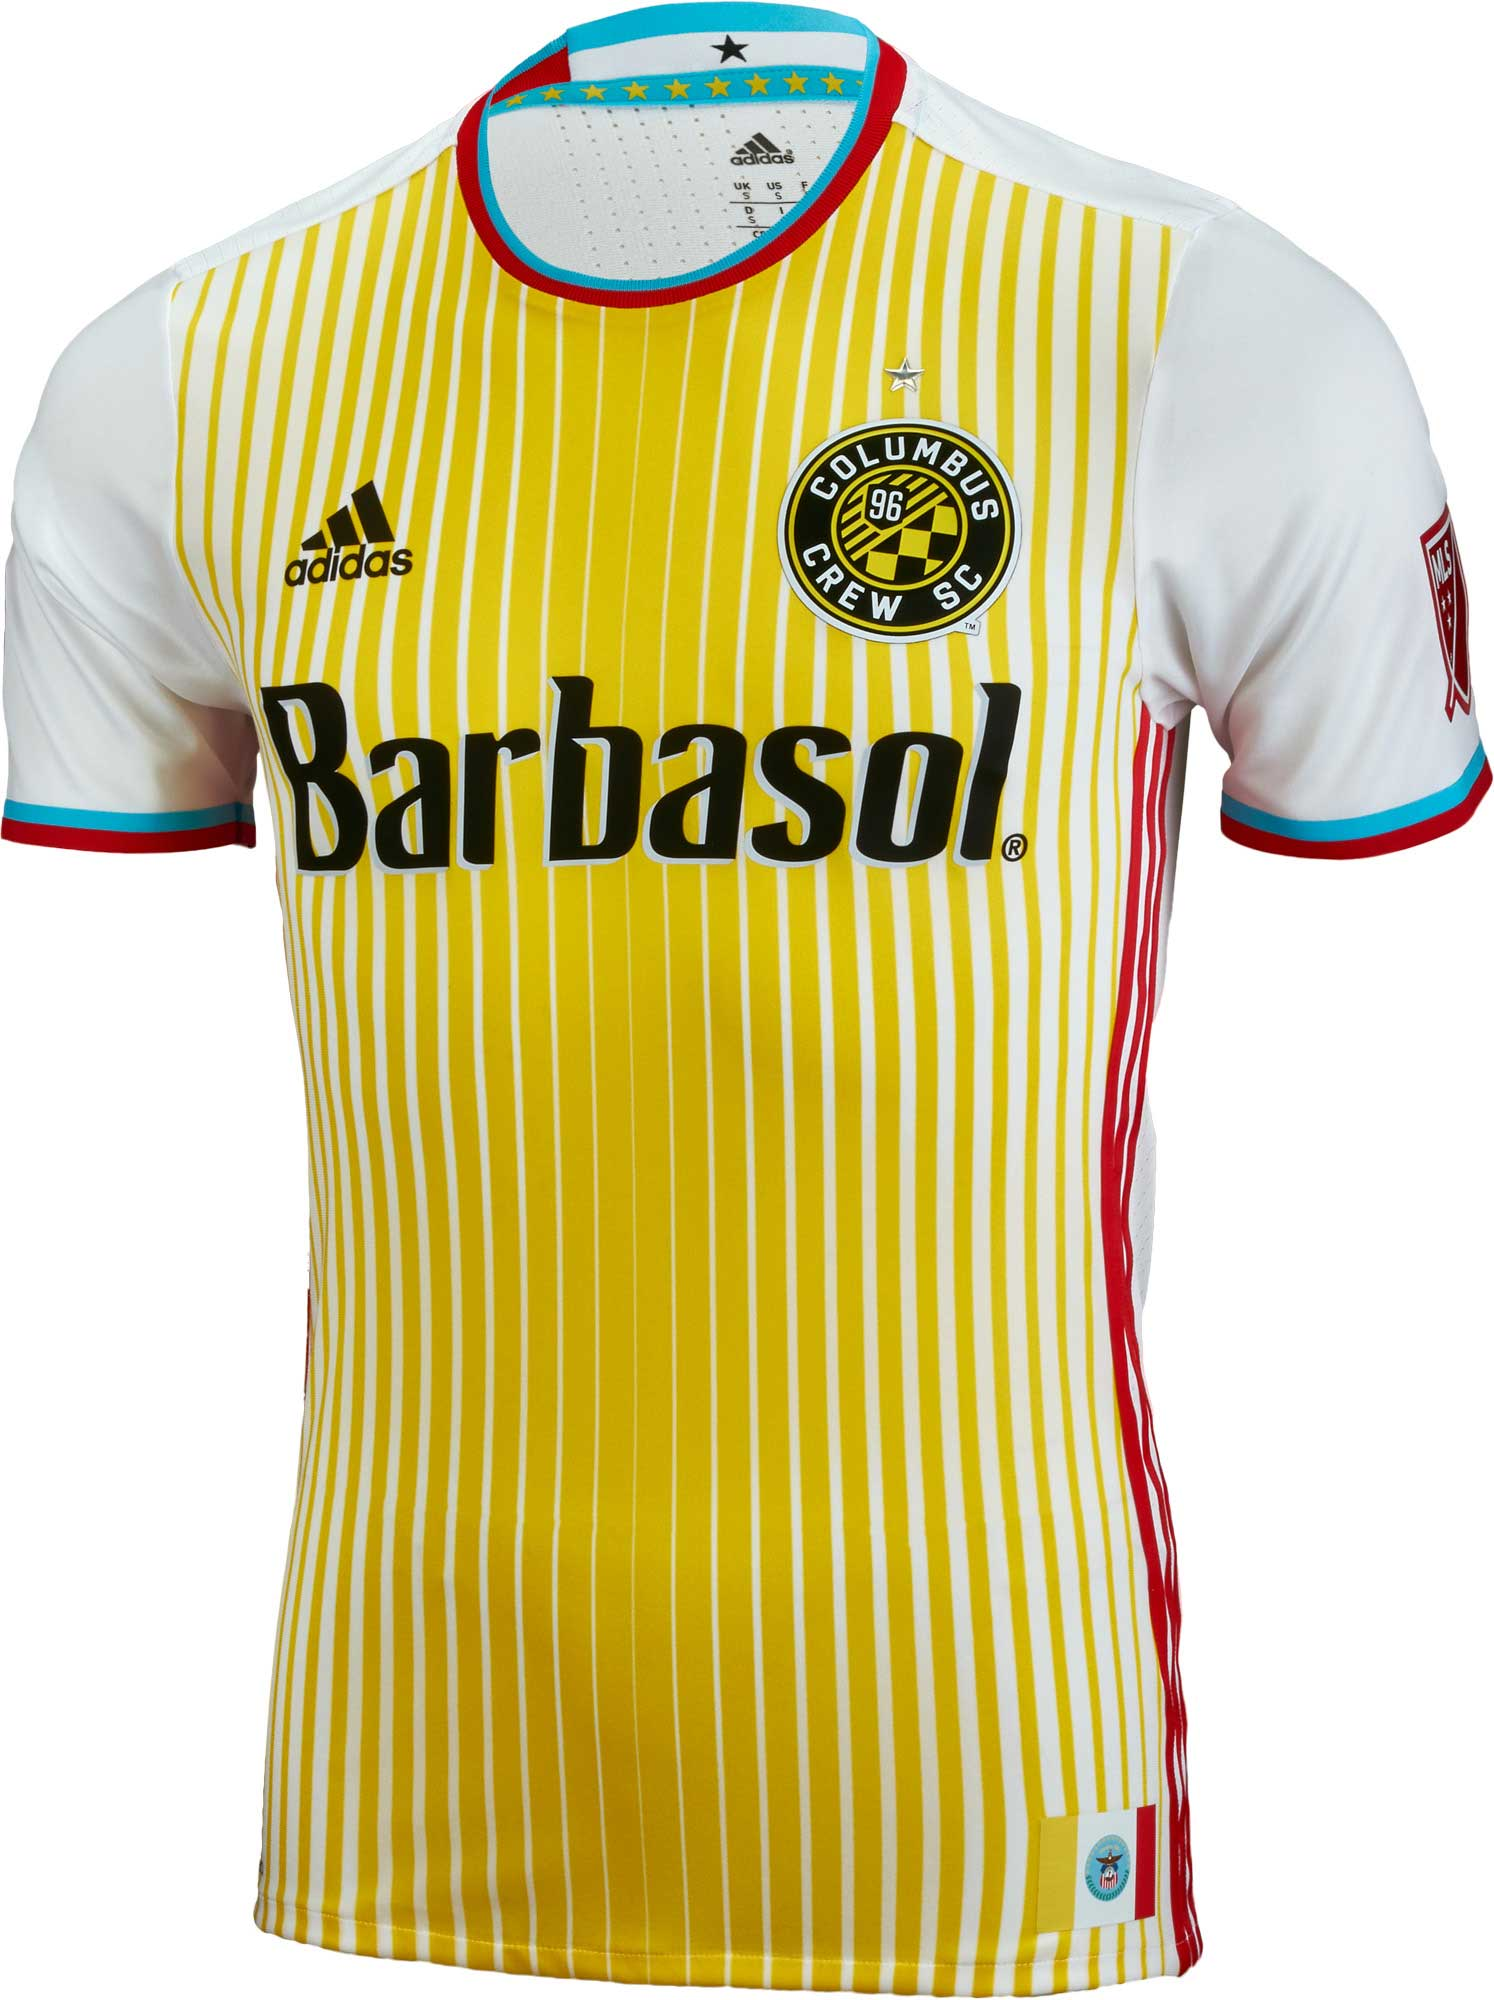 9caad1fc402 adidas Columbus Crew Away Jersey - 2016 Crew Soccer Jerseys